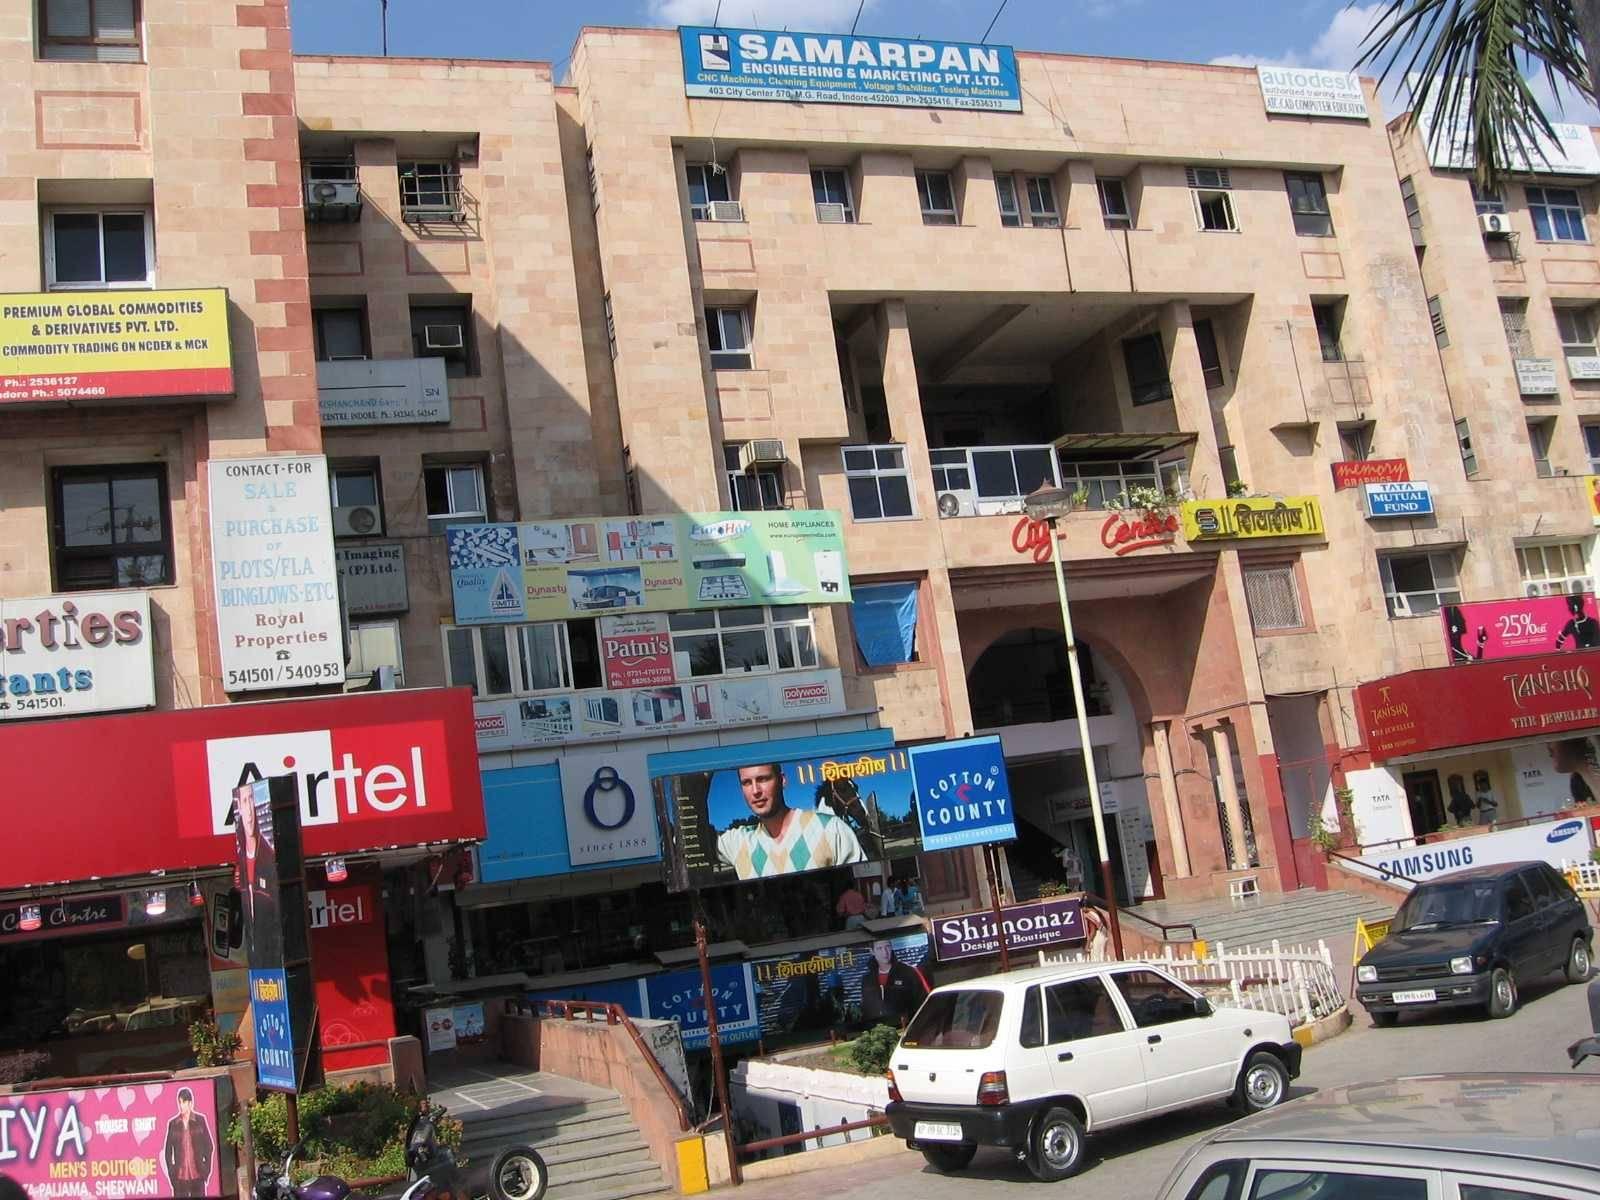 Samarpan Engineering & Marketin Pvt. Ltd., Office: 403 A City Centre near High Court, 570 Mahatma Gandhi Road , Showroom: G-48 City Centre near High Court, 570 Mahatma Gandhi Road , Indore, Madhya Pradesh, India